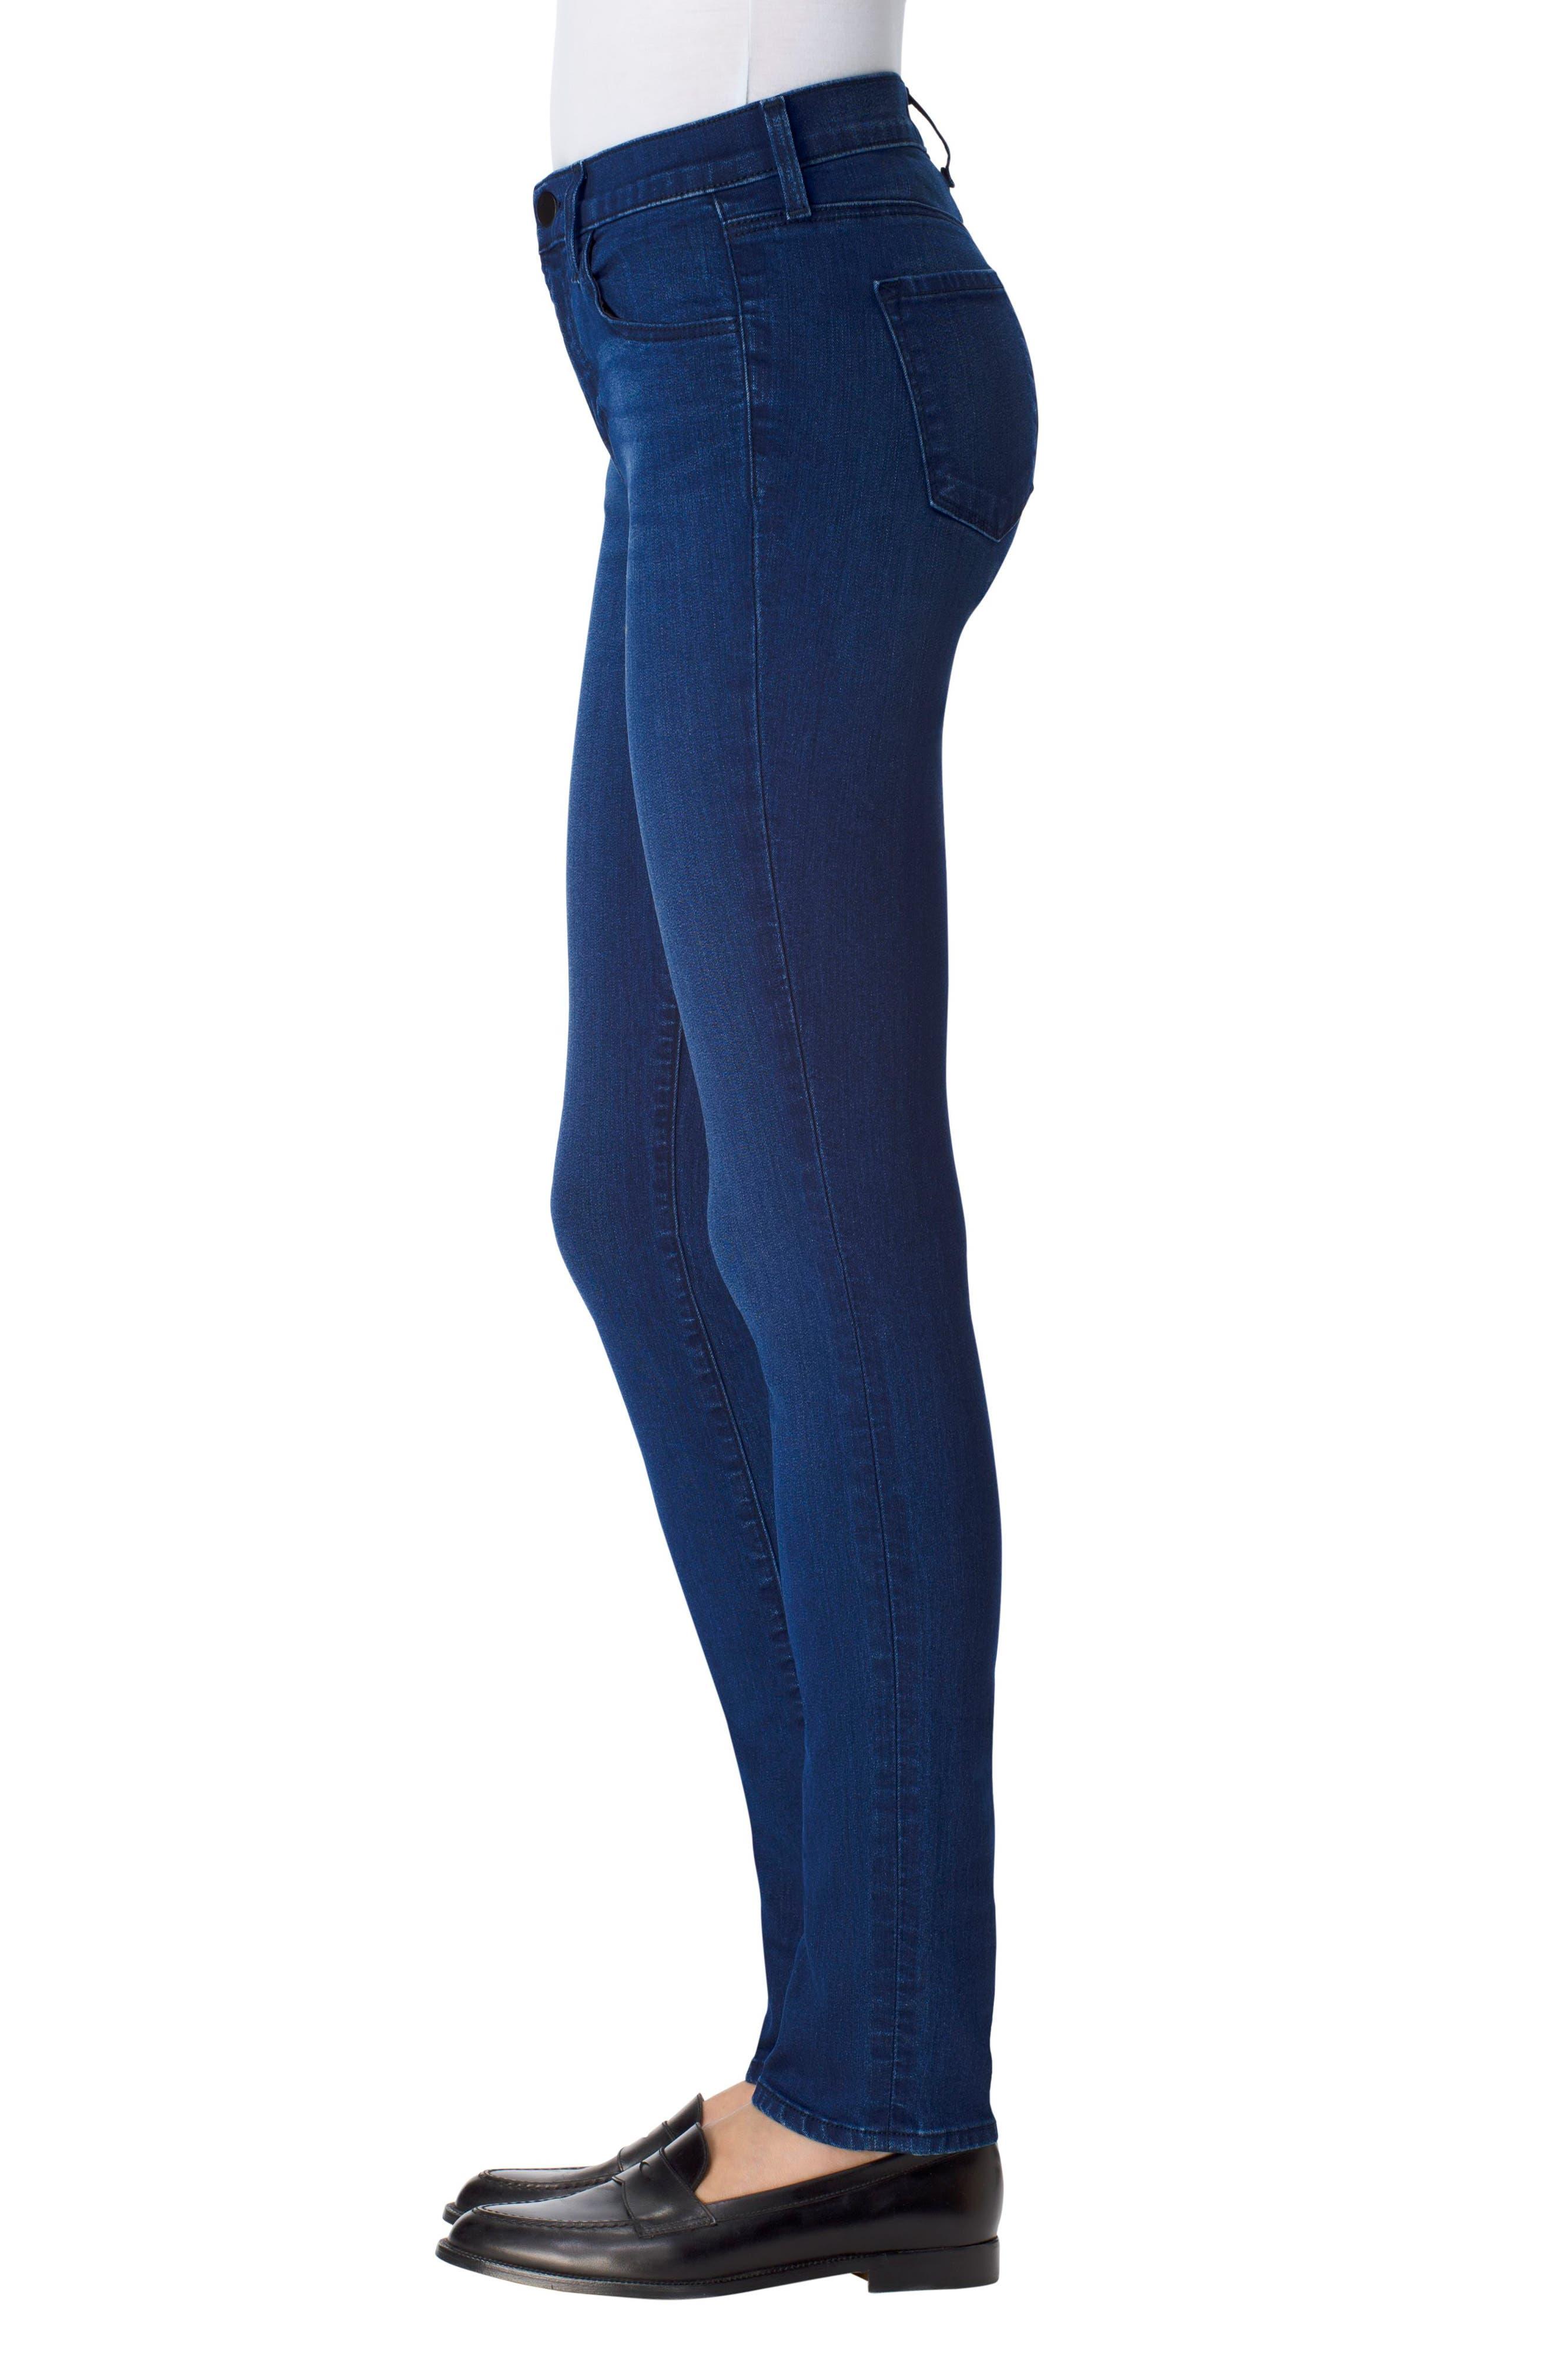 Alternate Image 3  - J Brand '811' Ankle Skinny Jeans (Sway)